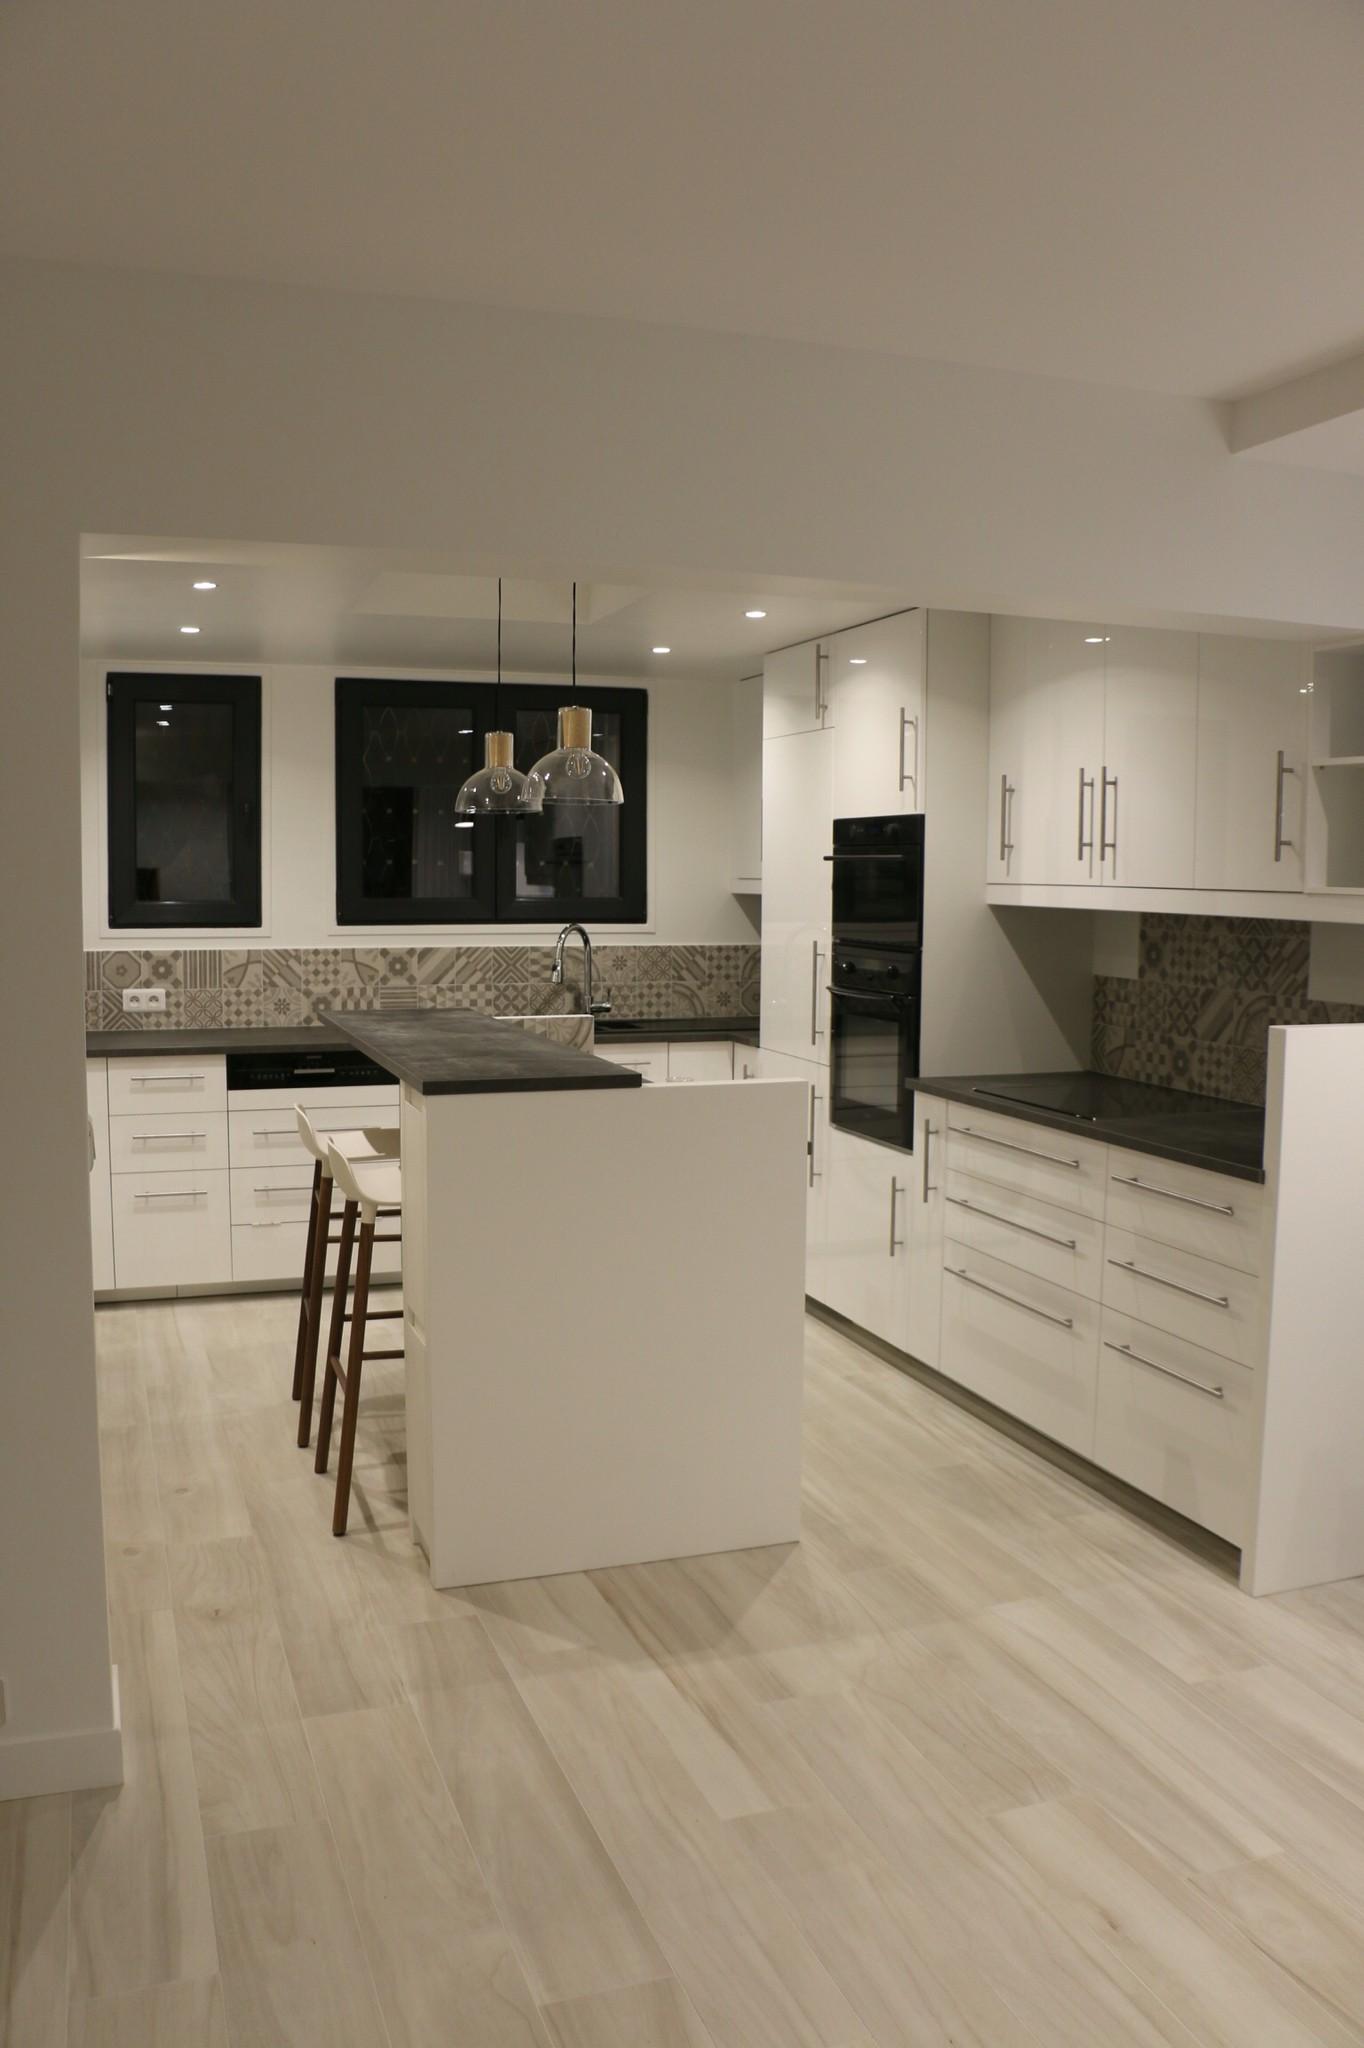 credence cuisine renovation id e pour cuisine. Black Bedroom Furniture Sets. Home Design Ideas